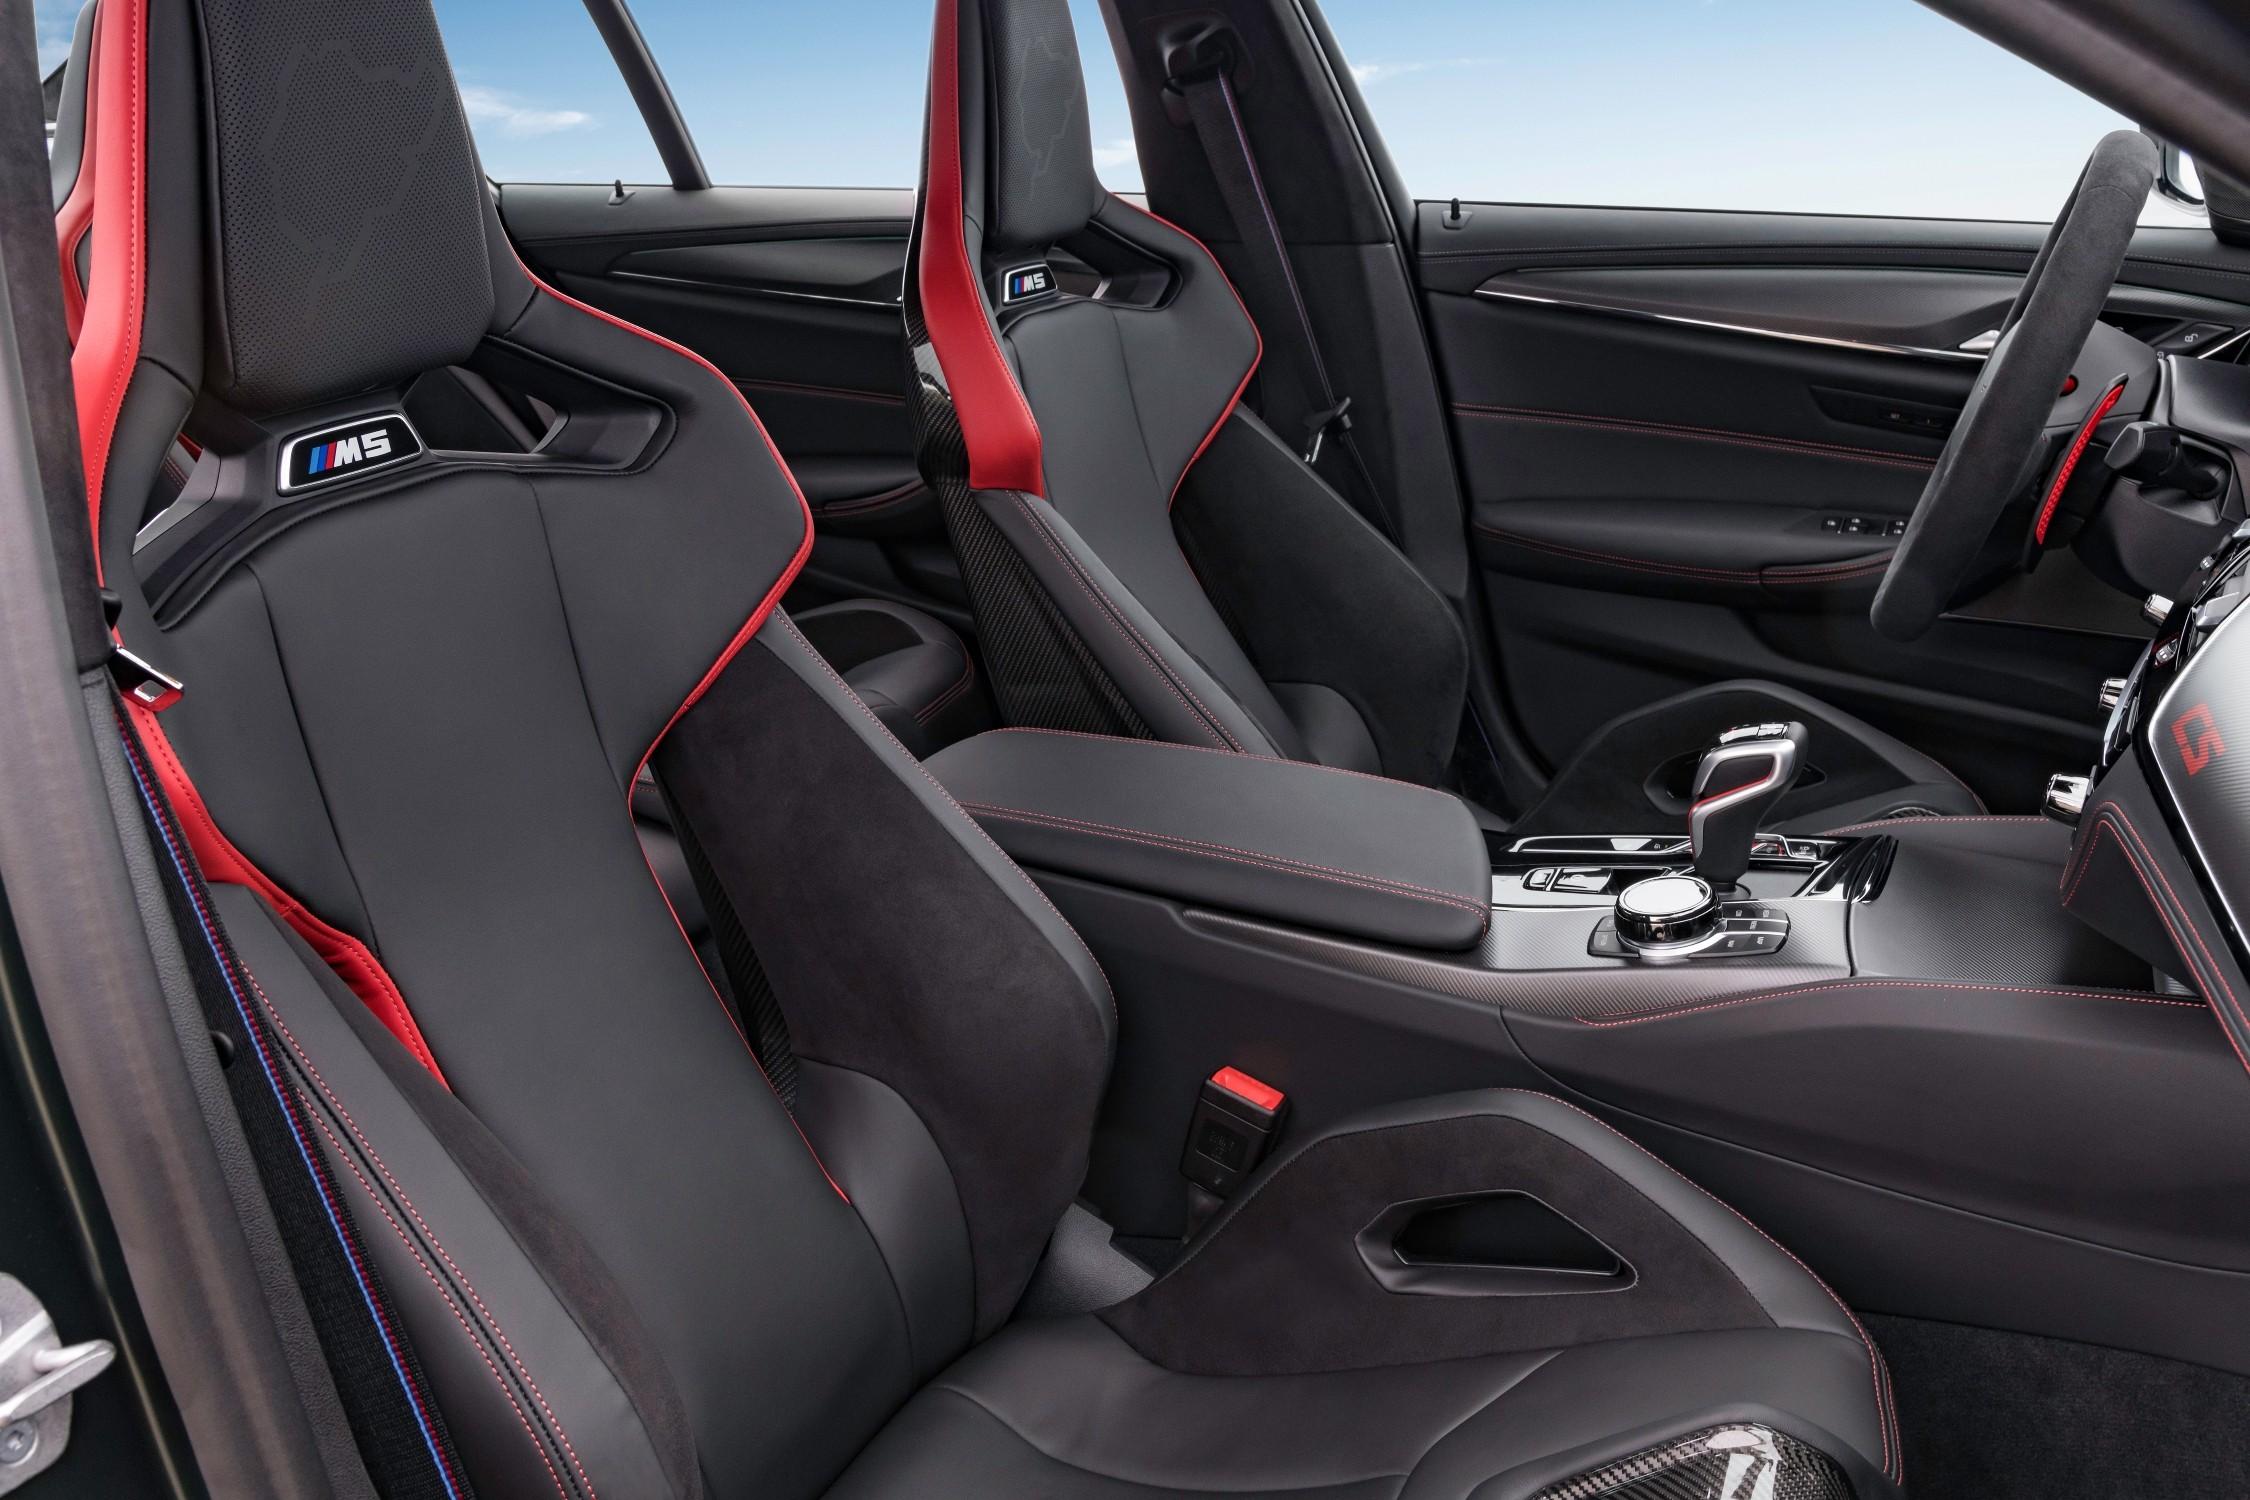 The new BMW M5 CS Brandspurng1